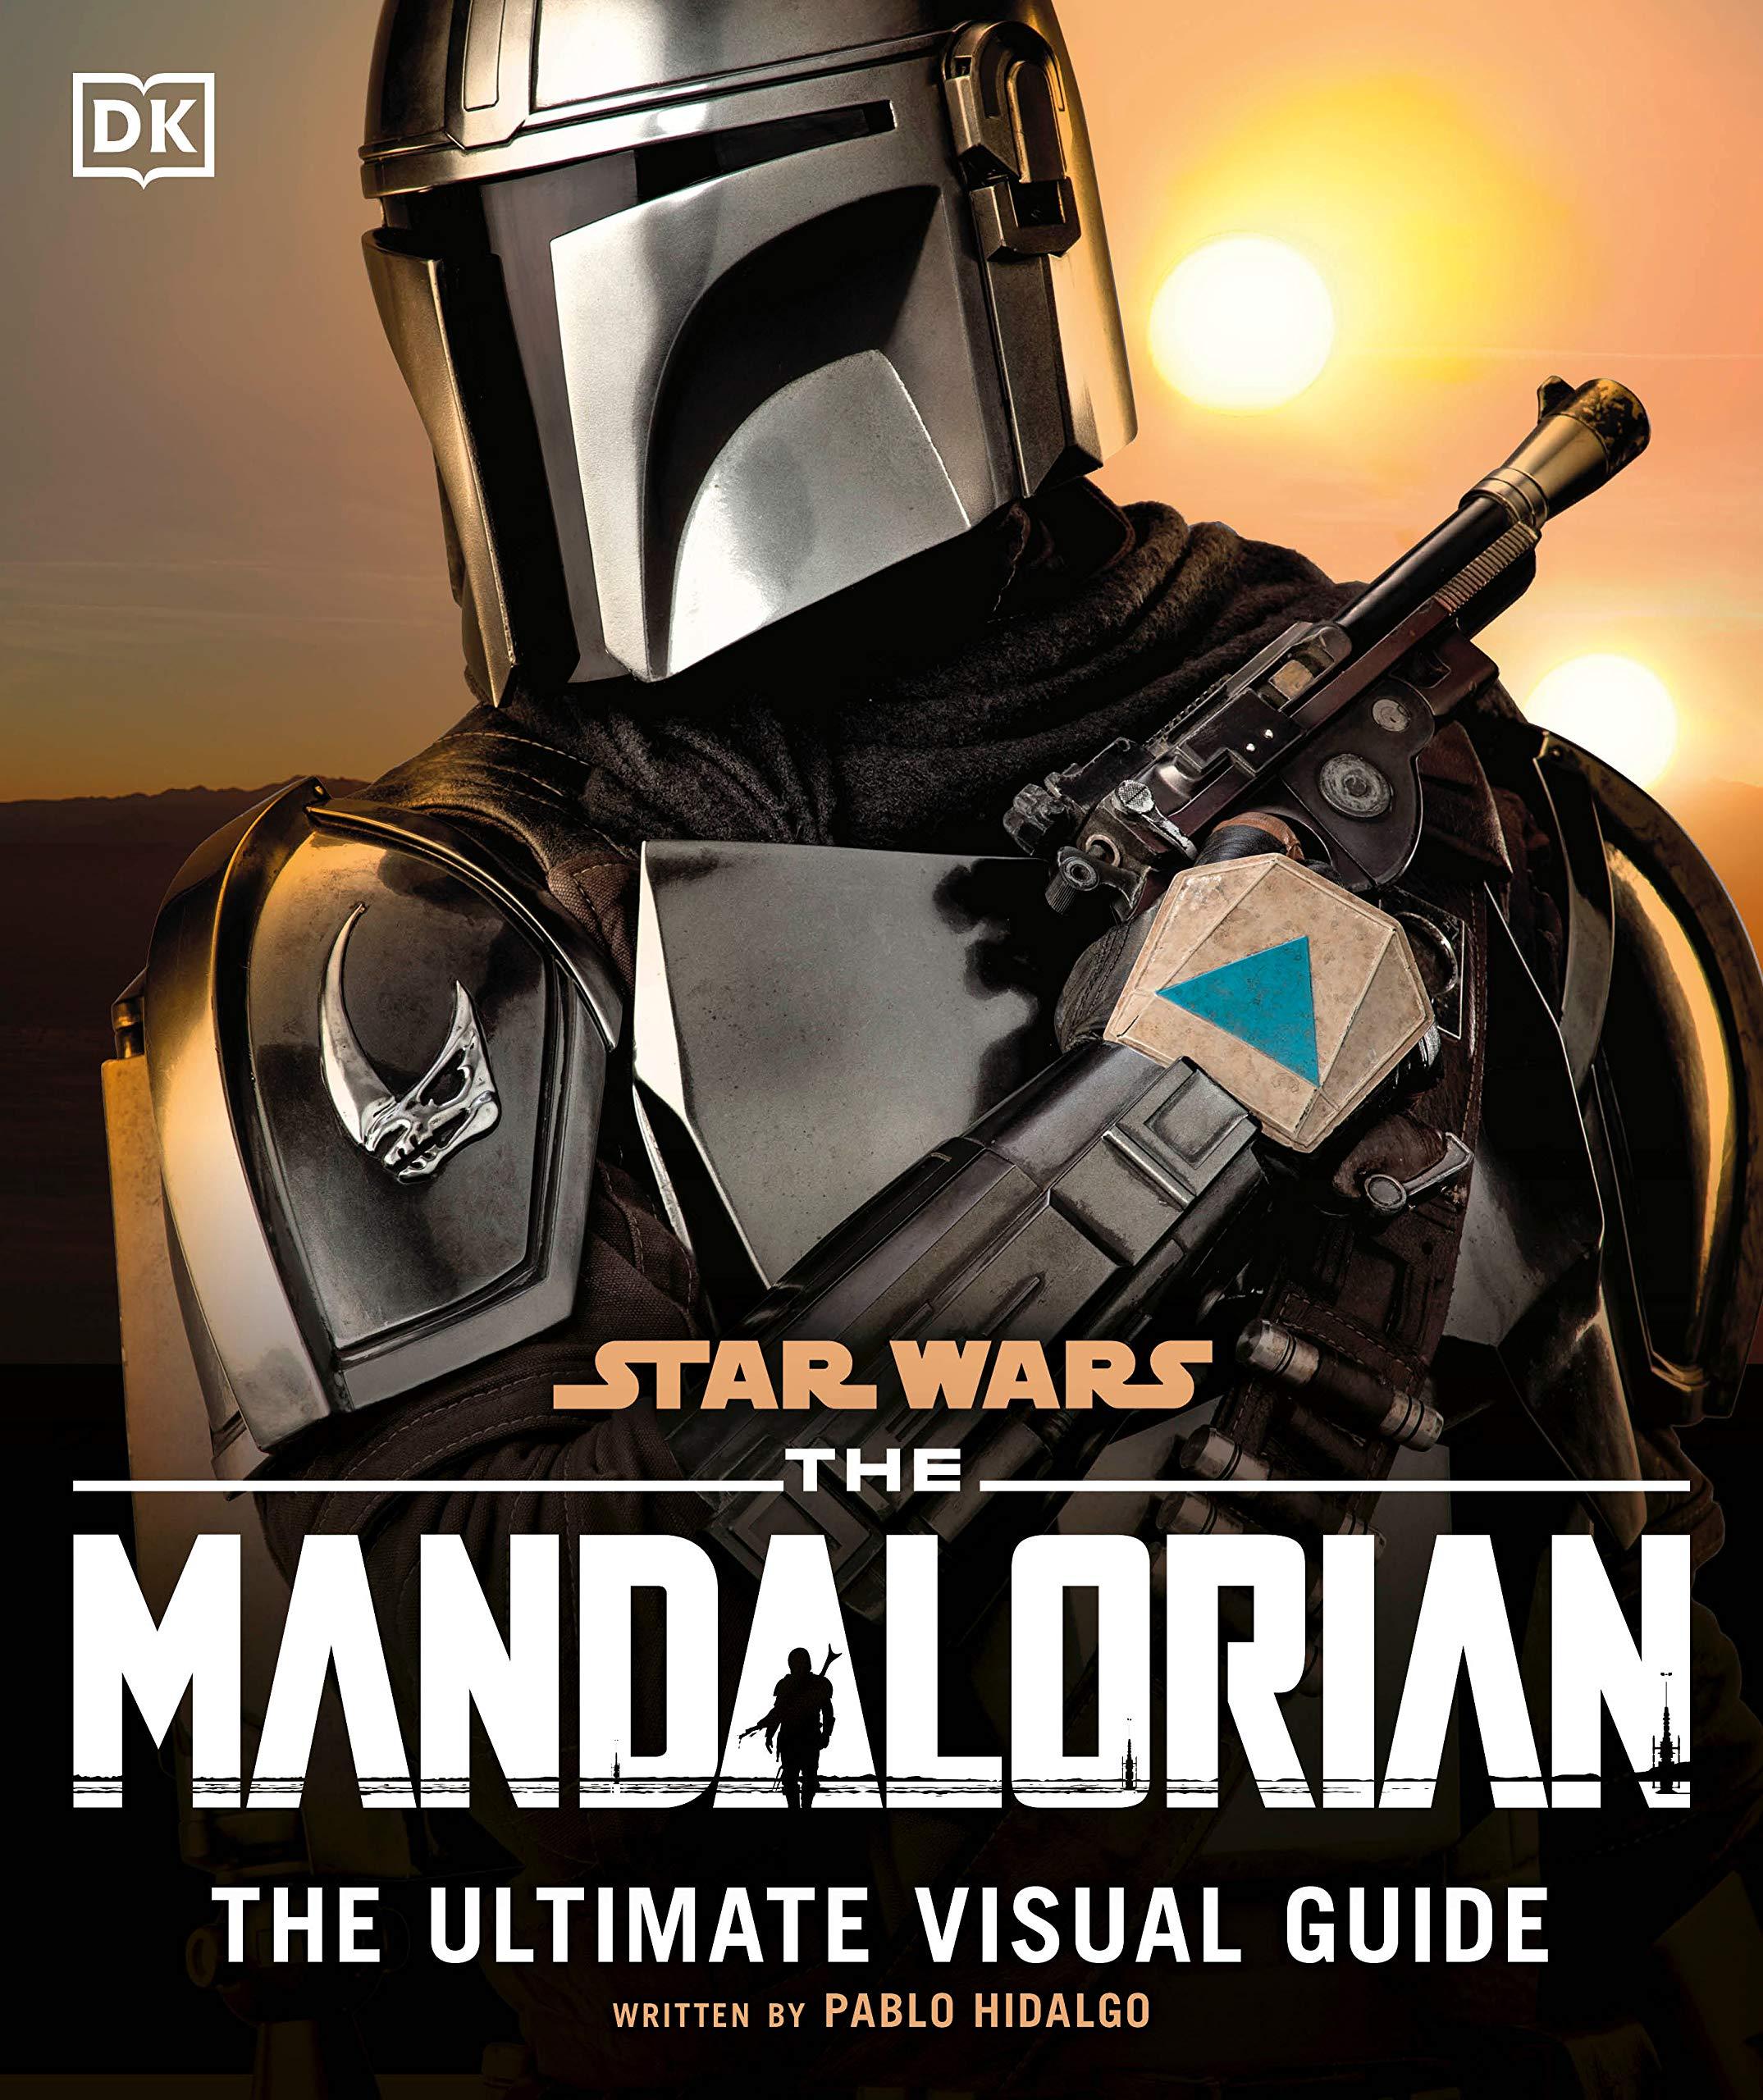 Star Wars: The Mandalorian: The Ultimate Visual Guide